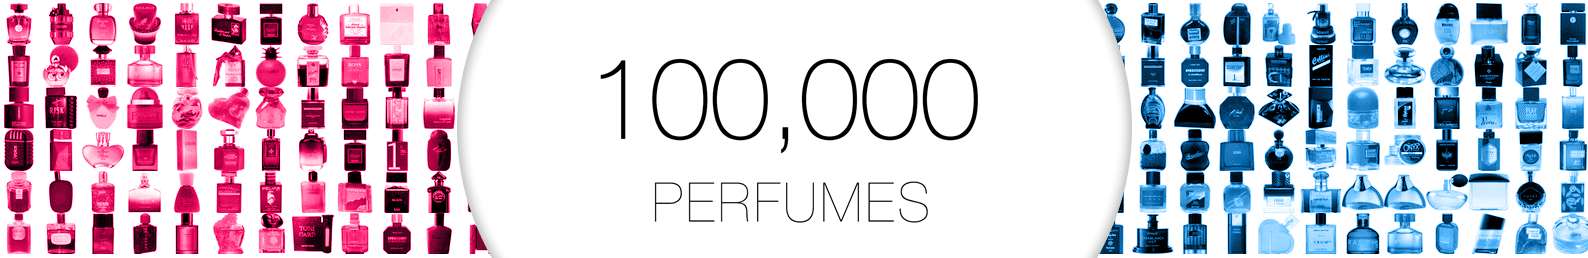 100,000 Perfumes